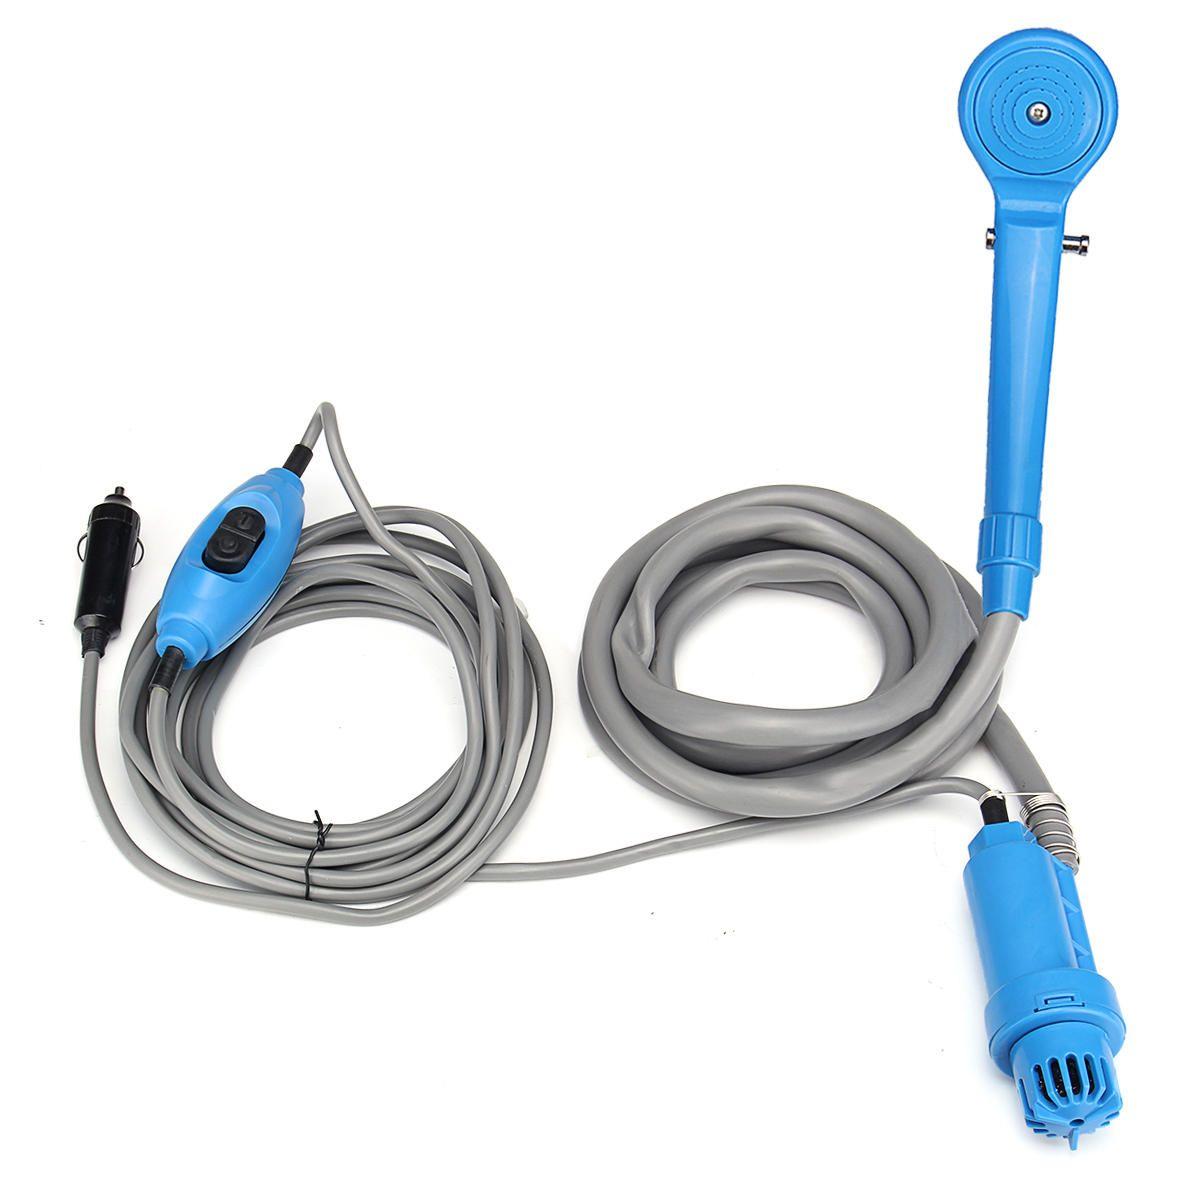 US29.04 12V Electric Portable Car Shower System Outdoor